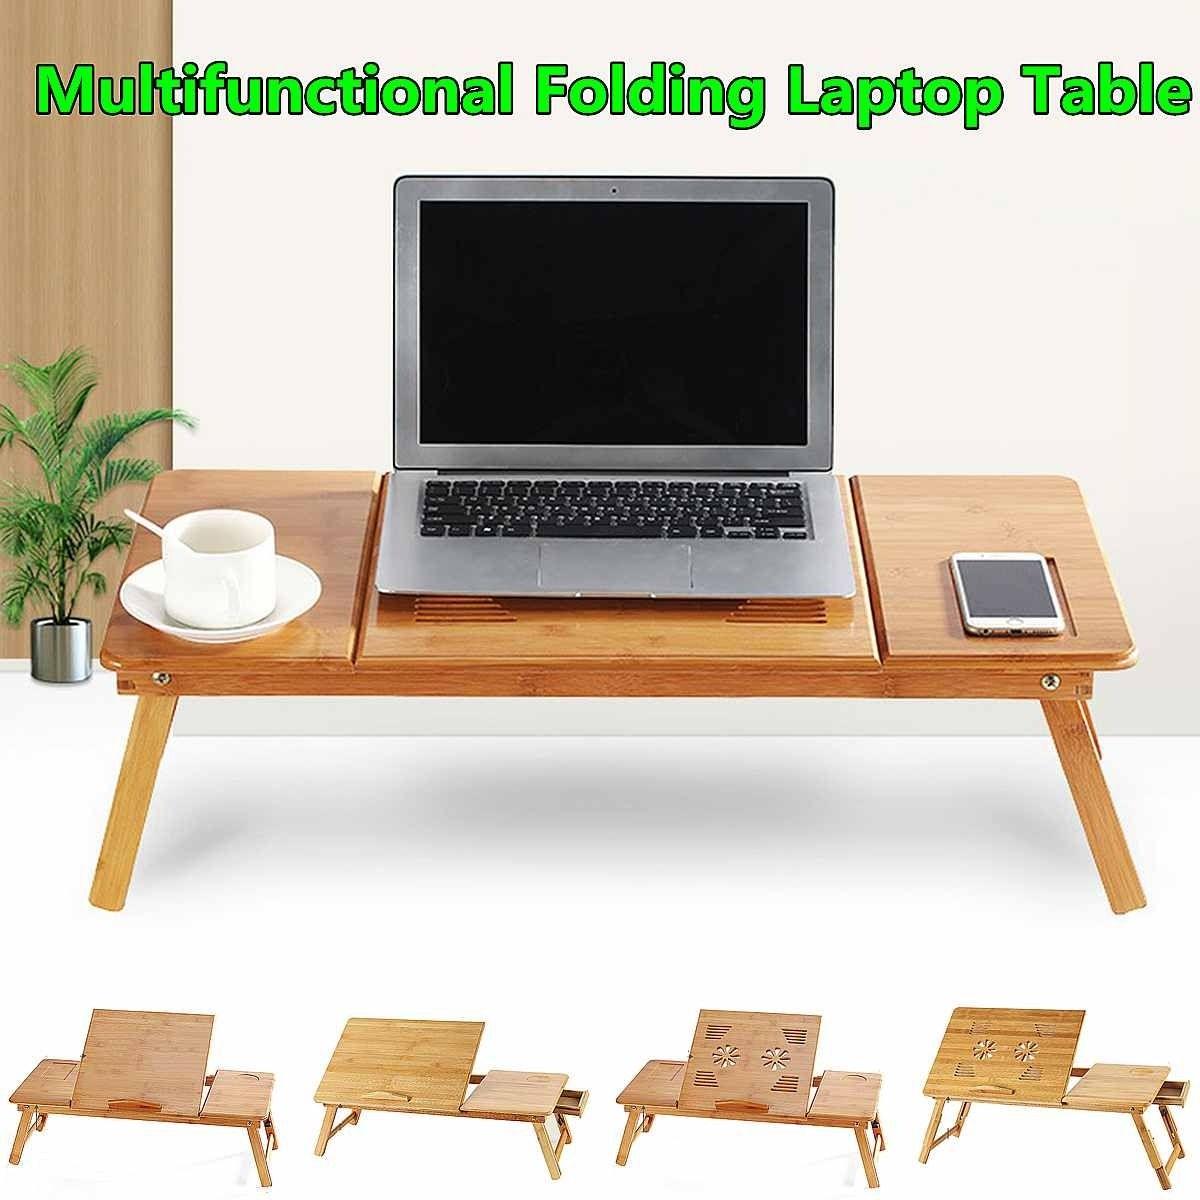 Portable Folding Bamboo Laptop Table, Portable Folding Computer Desk Laptop Table Workstation Furniture